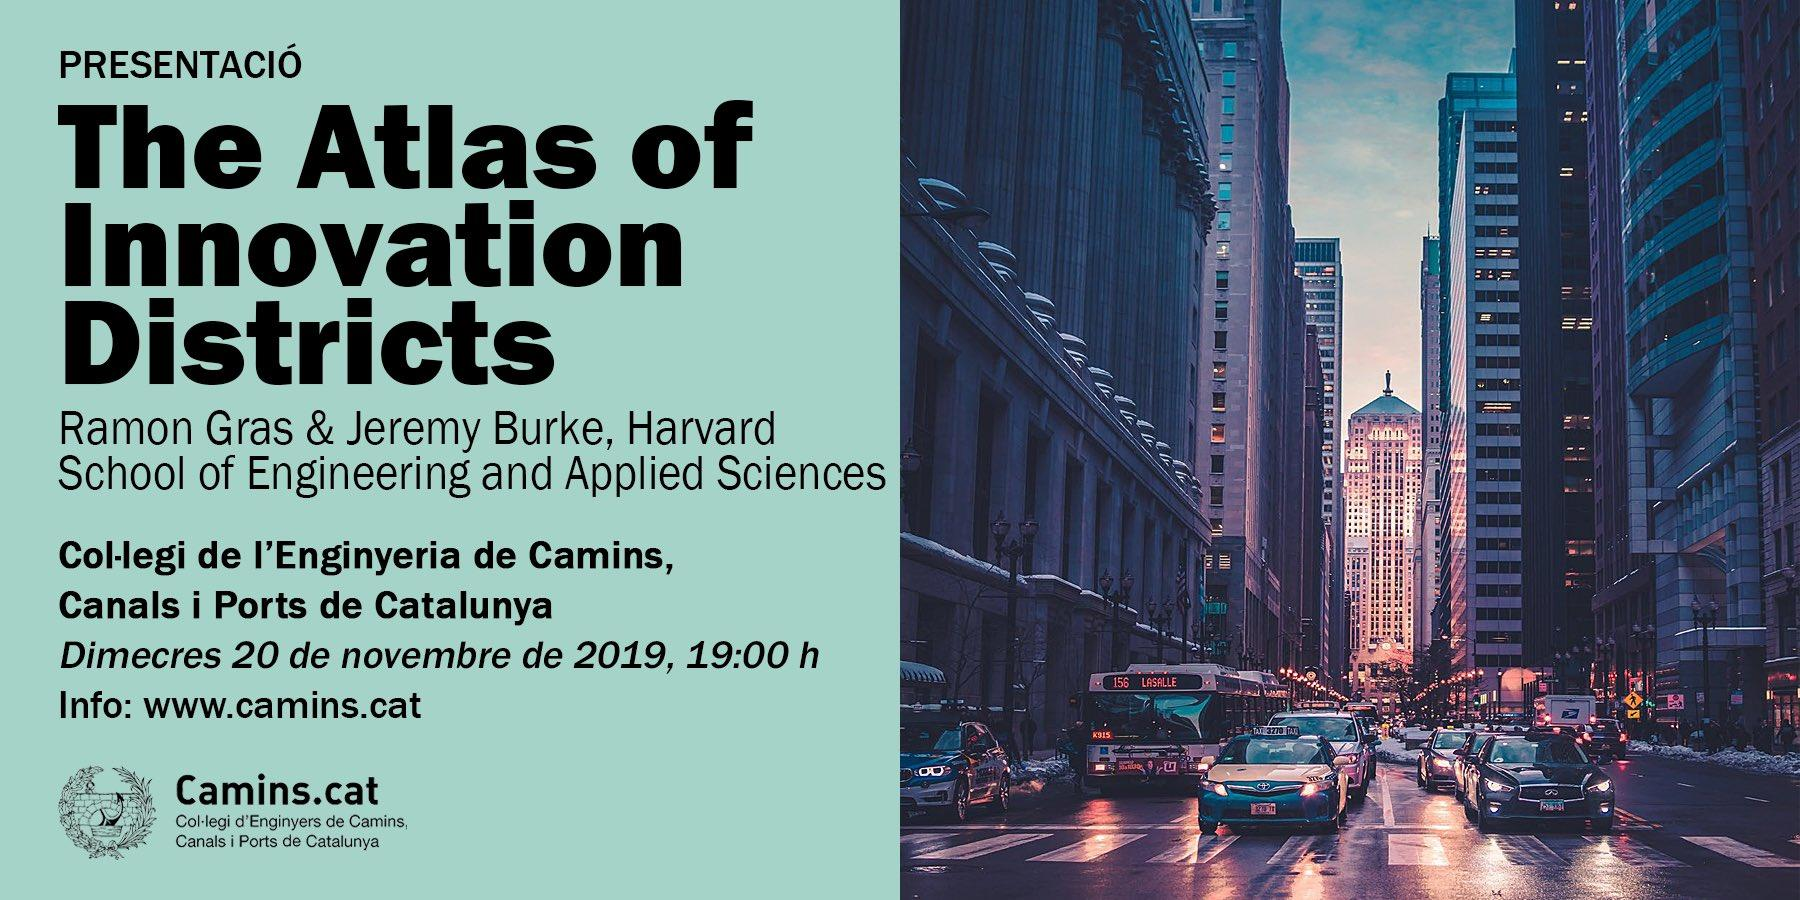 Presentació ?The Atlas of Innovation Districts?. Camins.cat